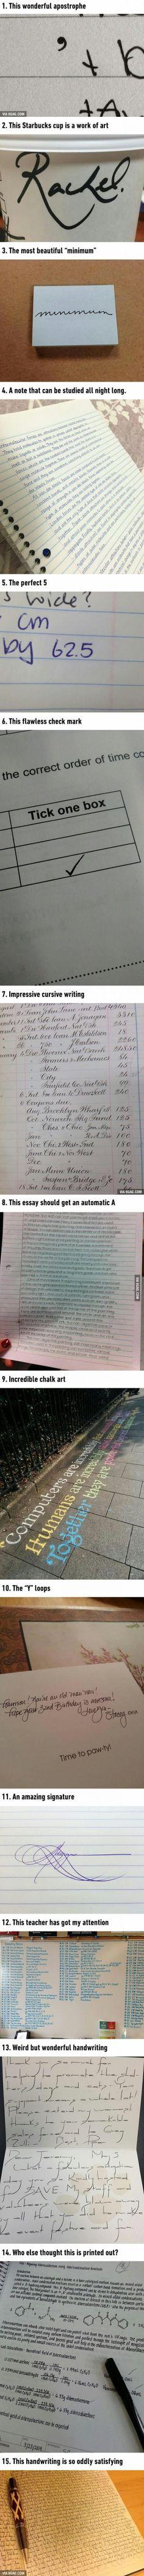 Satisfying handwriting, nnnhhh